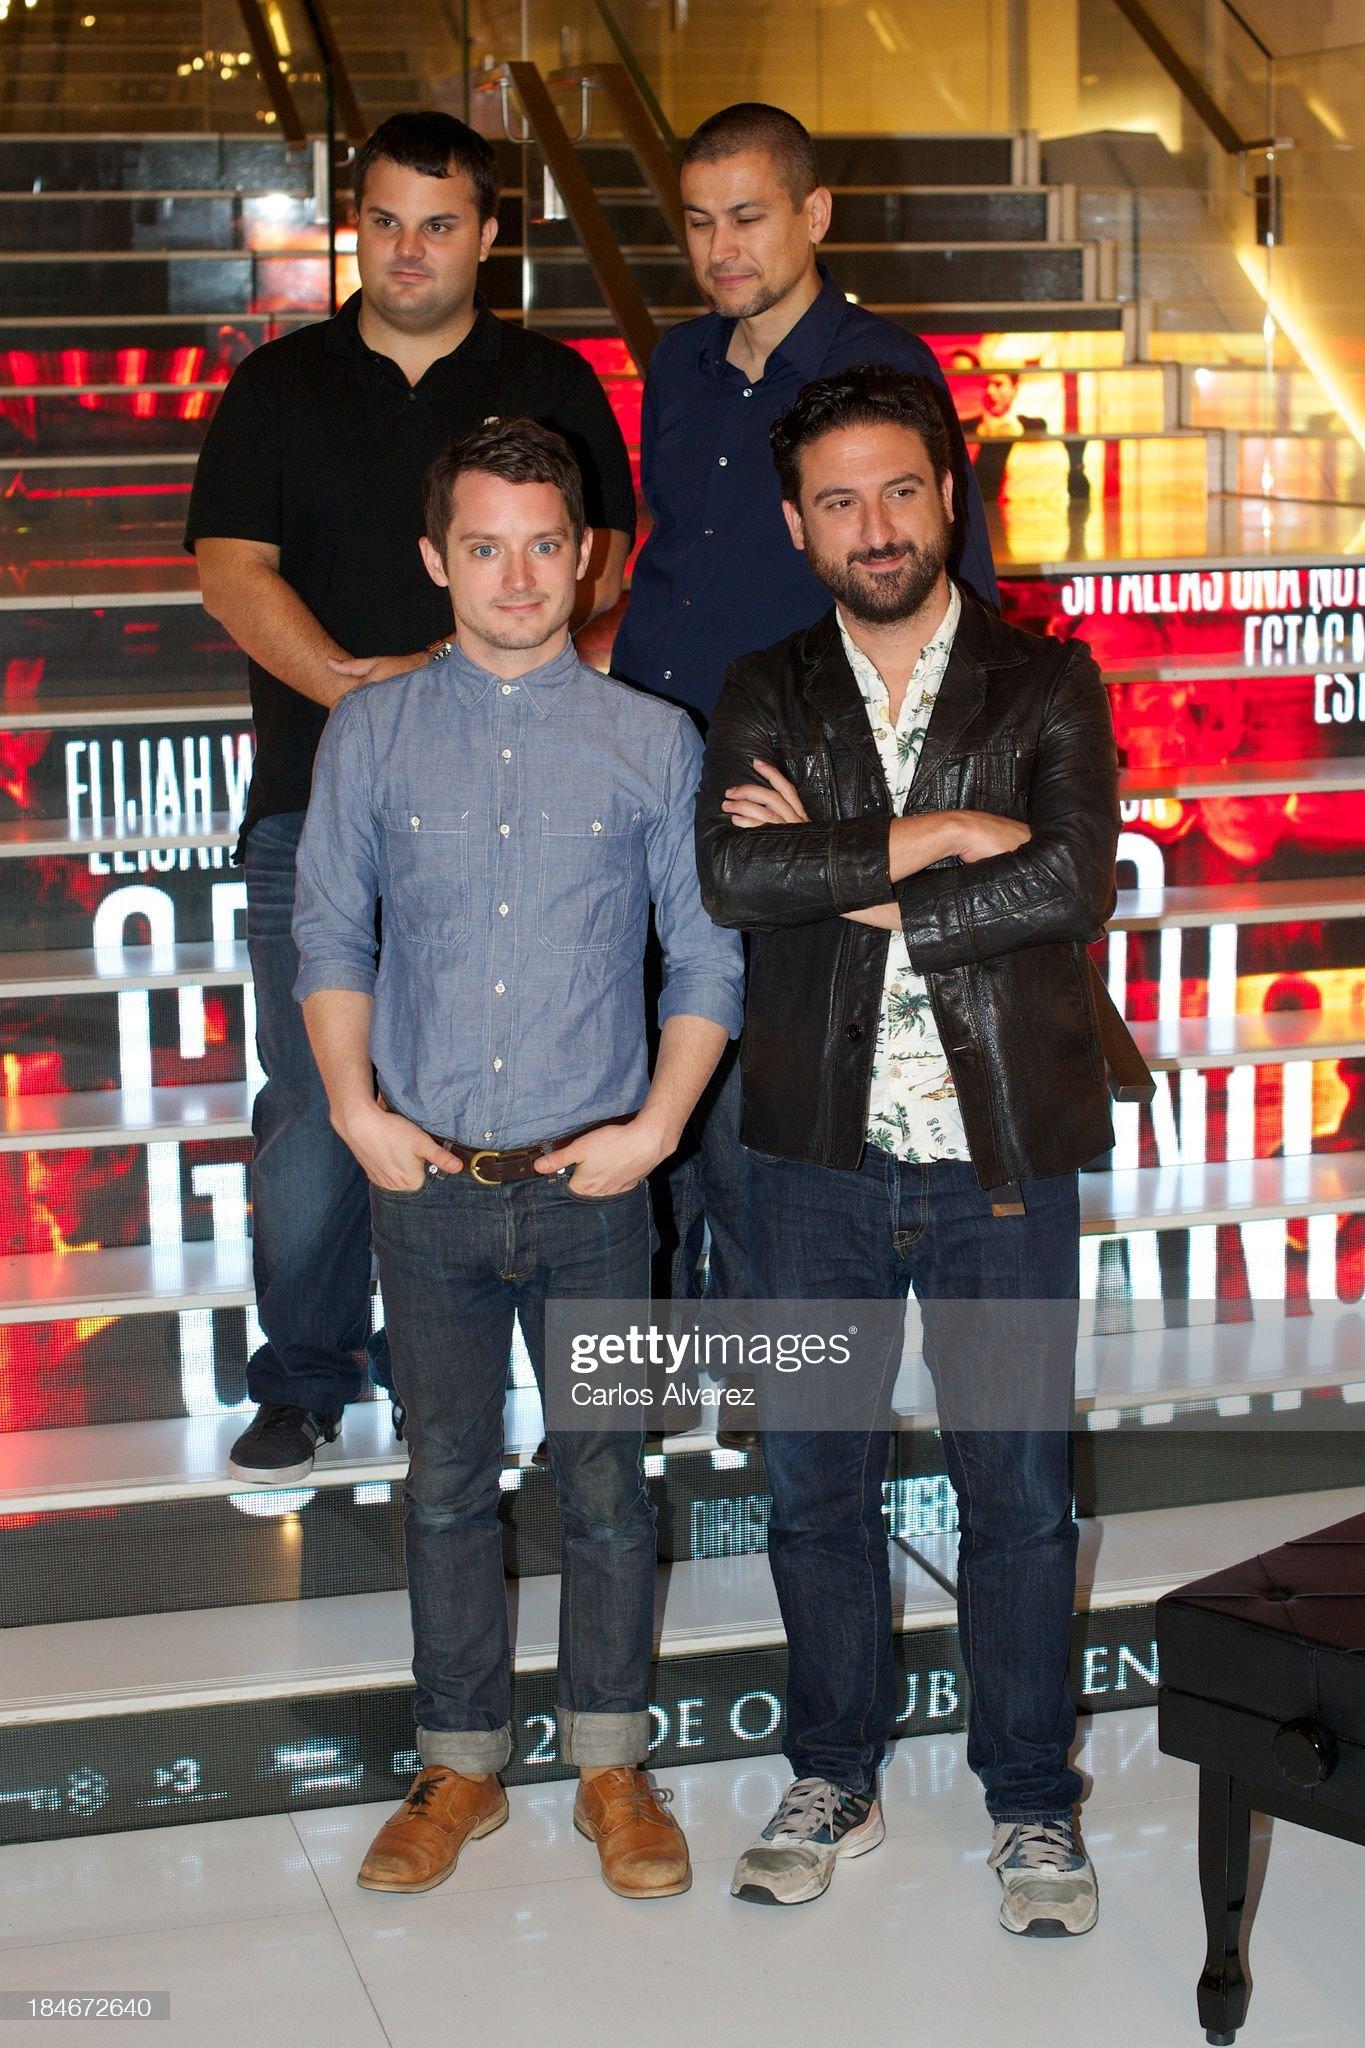 ¿Cuánto mide Eugenio Mira? - Altura Producer-adrian-guerra-actor-elijah-wood-producer-rodrigo-cortes-and-picture-id184672640?s=2048x2048